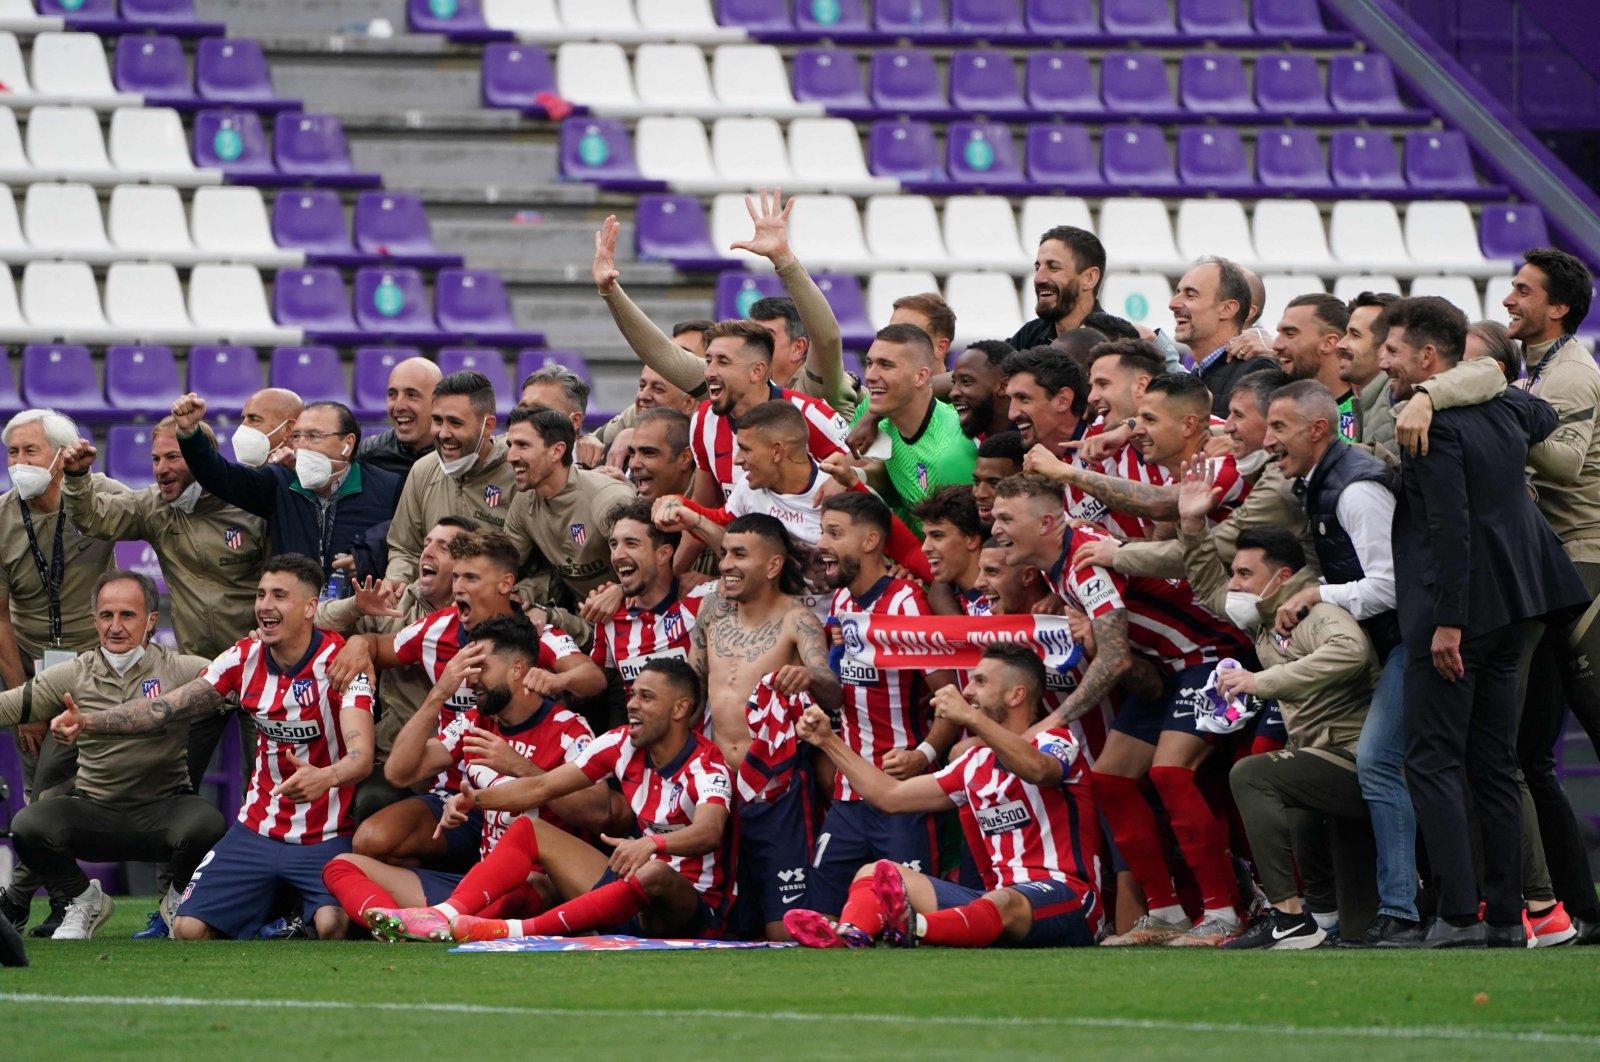 Atletico Madrid players celebrate the Spanish La Liga title at the Jose Zorilla stadium, Valladolid, Spain, May 22, 2021. (AFP Photo)